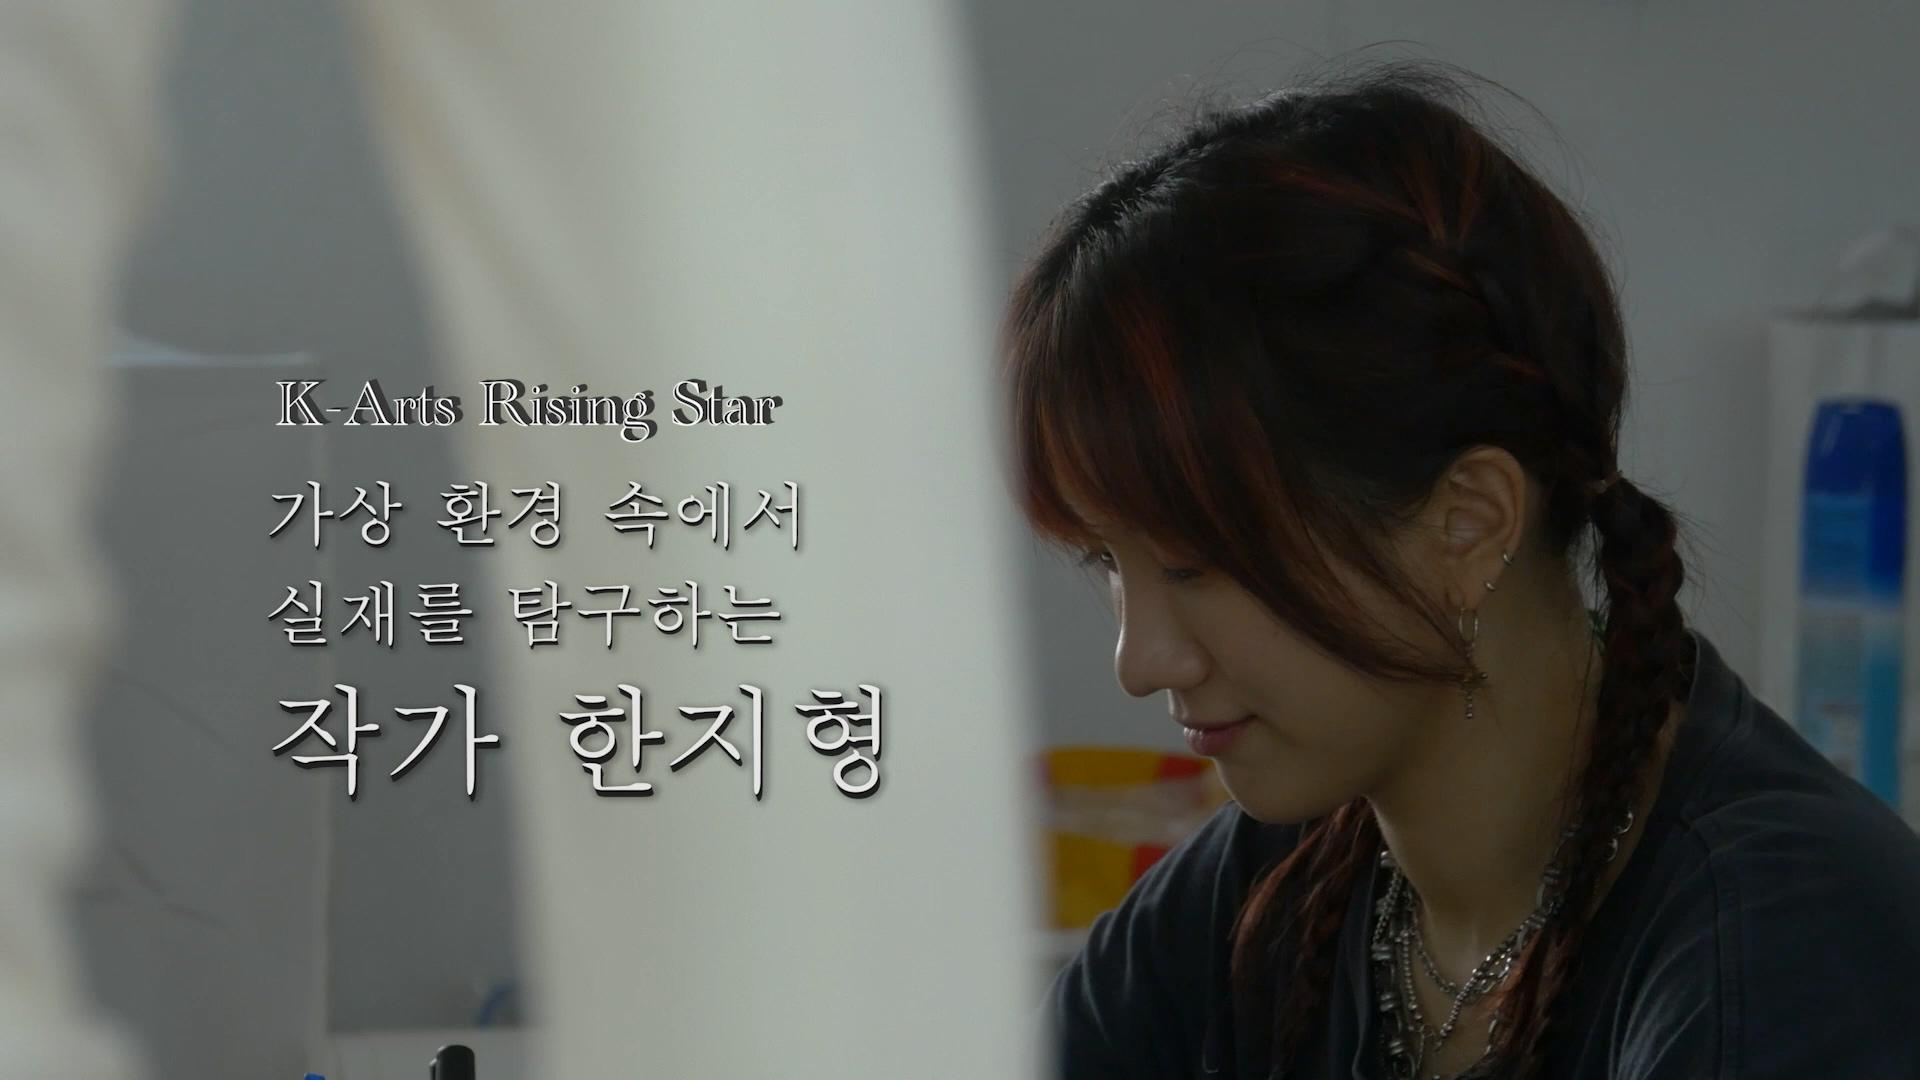 K-Arts Rising Star 한지형 작가